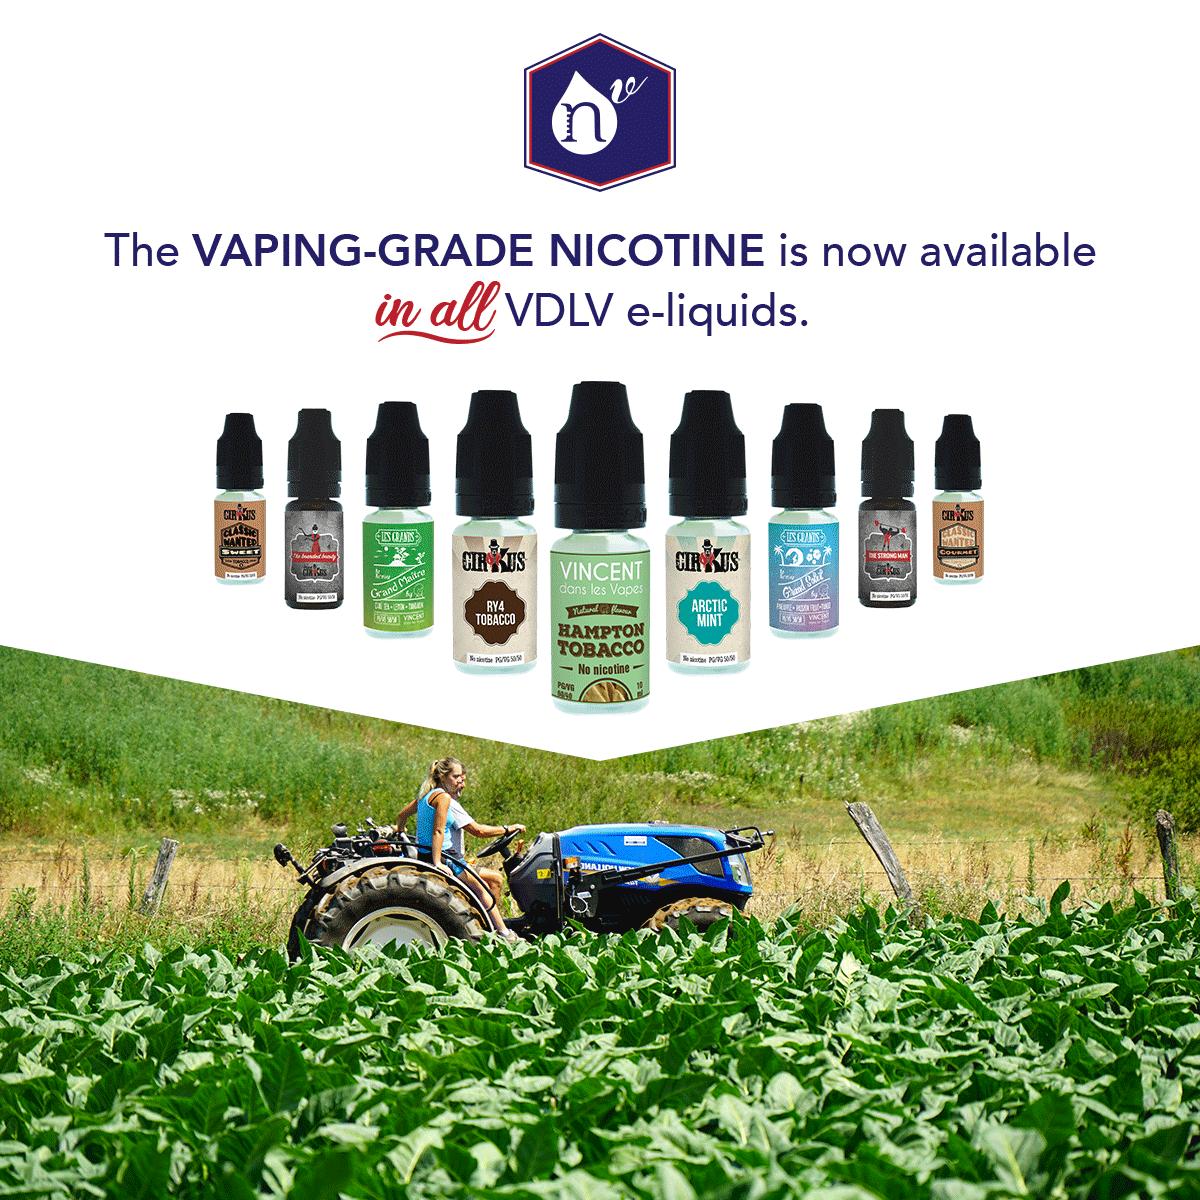 VDLV, n°1 European producer of Vaping-Grade Nicotine